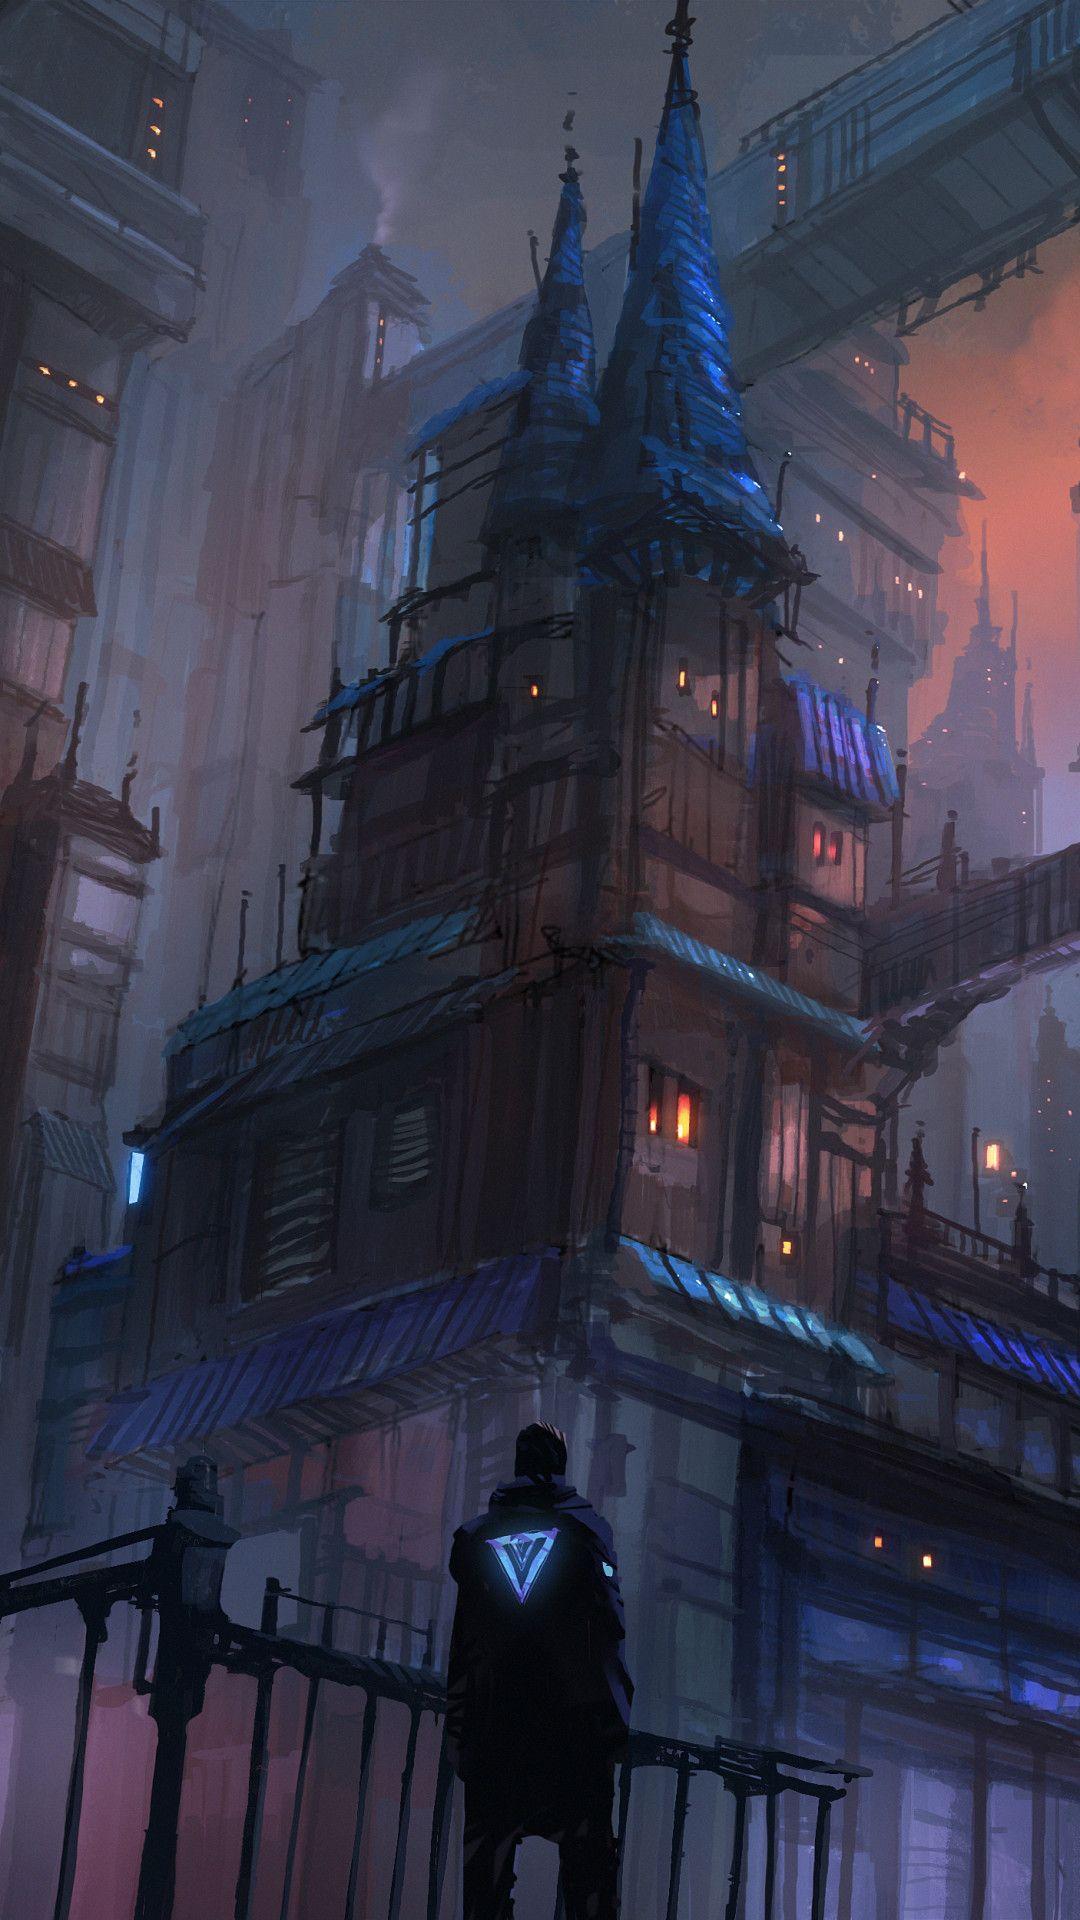 Cyberpunk City Evening Mood 5k Mobile Wallpaper (iPhone